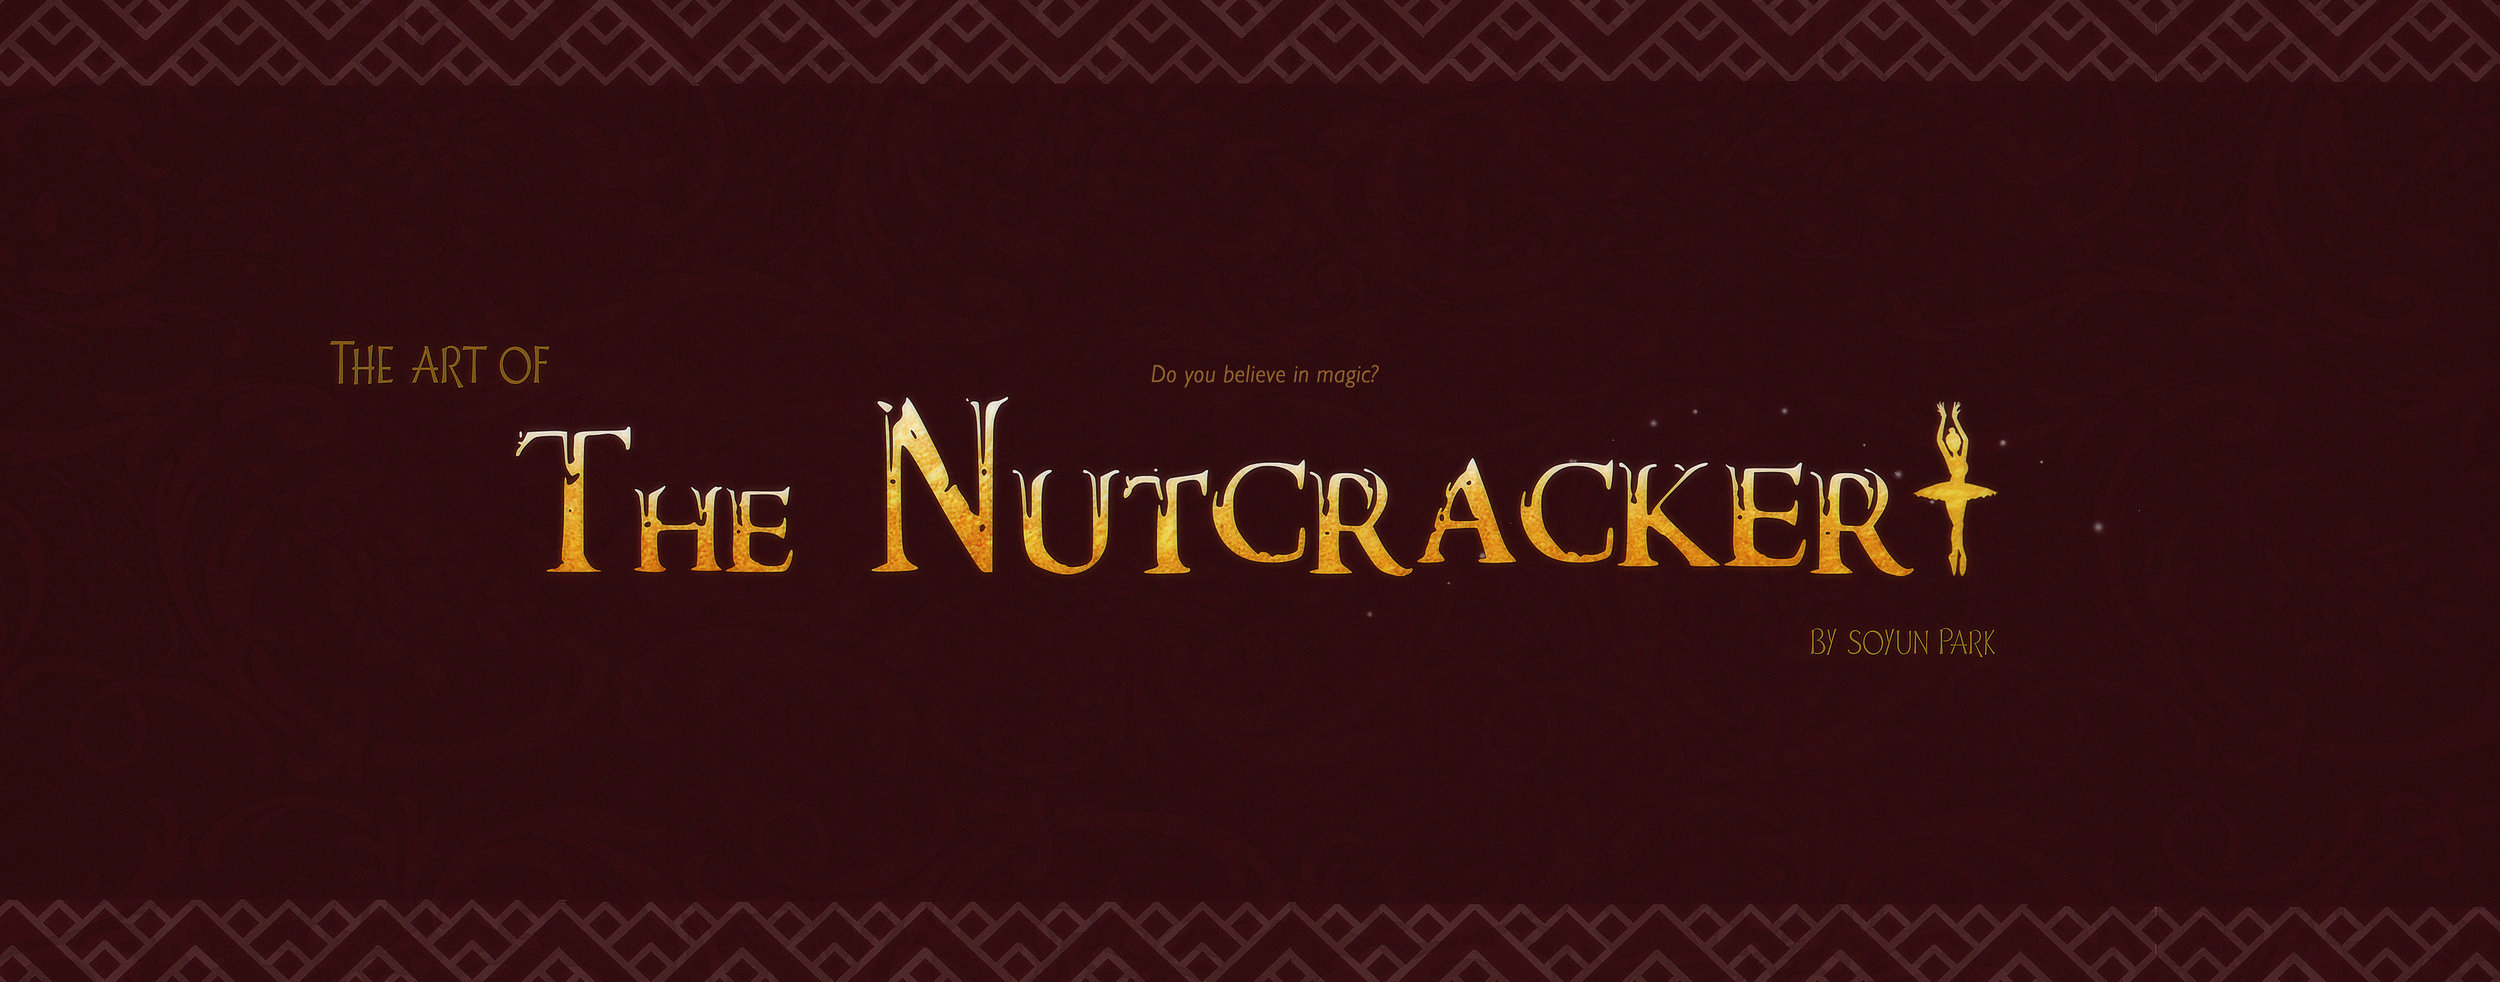 Soyun Park_The nutcracker_Christmas.jpg